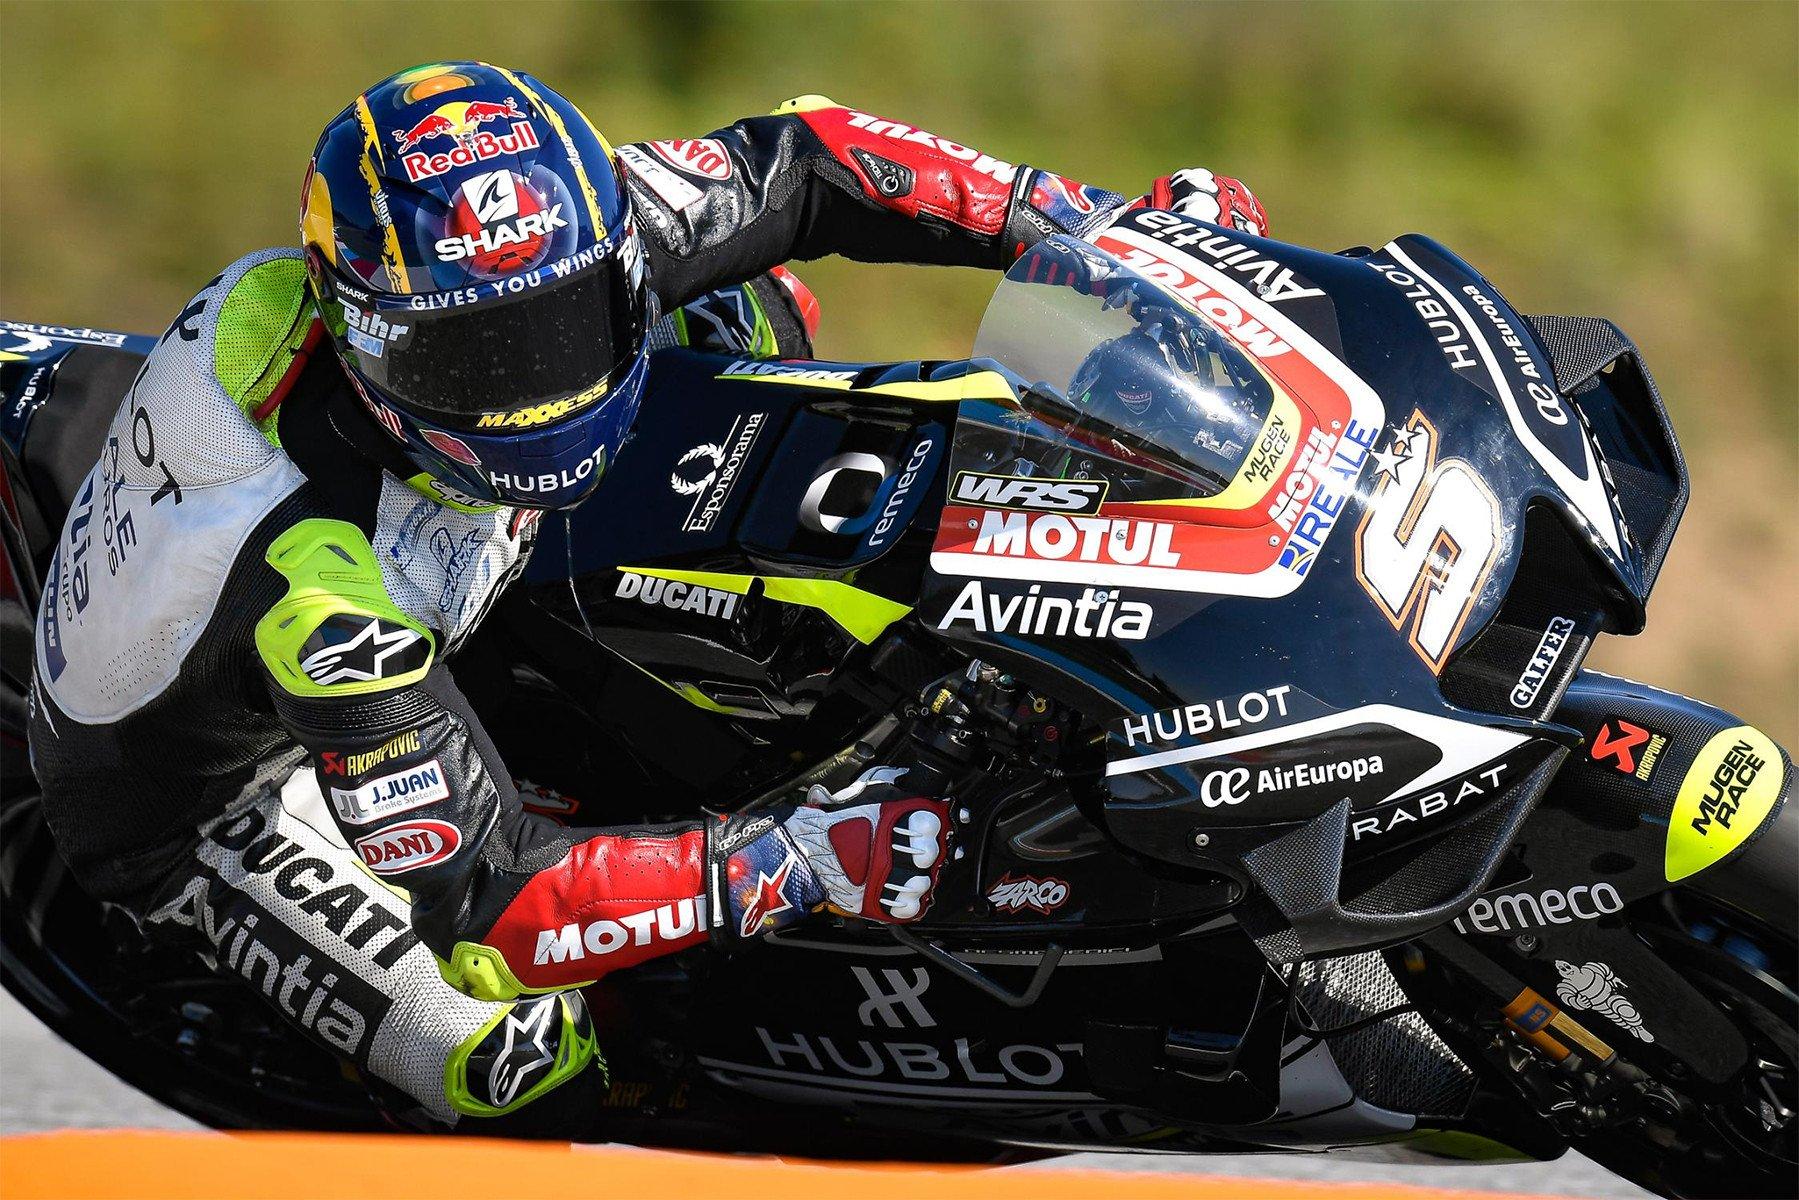 Johann Zarco Bikin Kejutan di Pengujung Kualifikasi MotoGP Ceko - JPNN.com